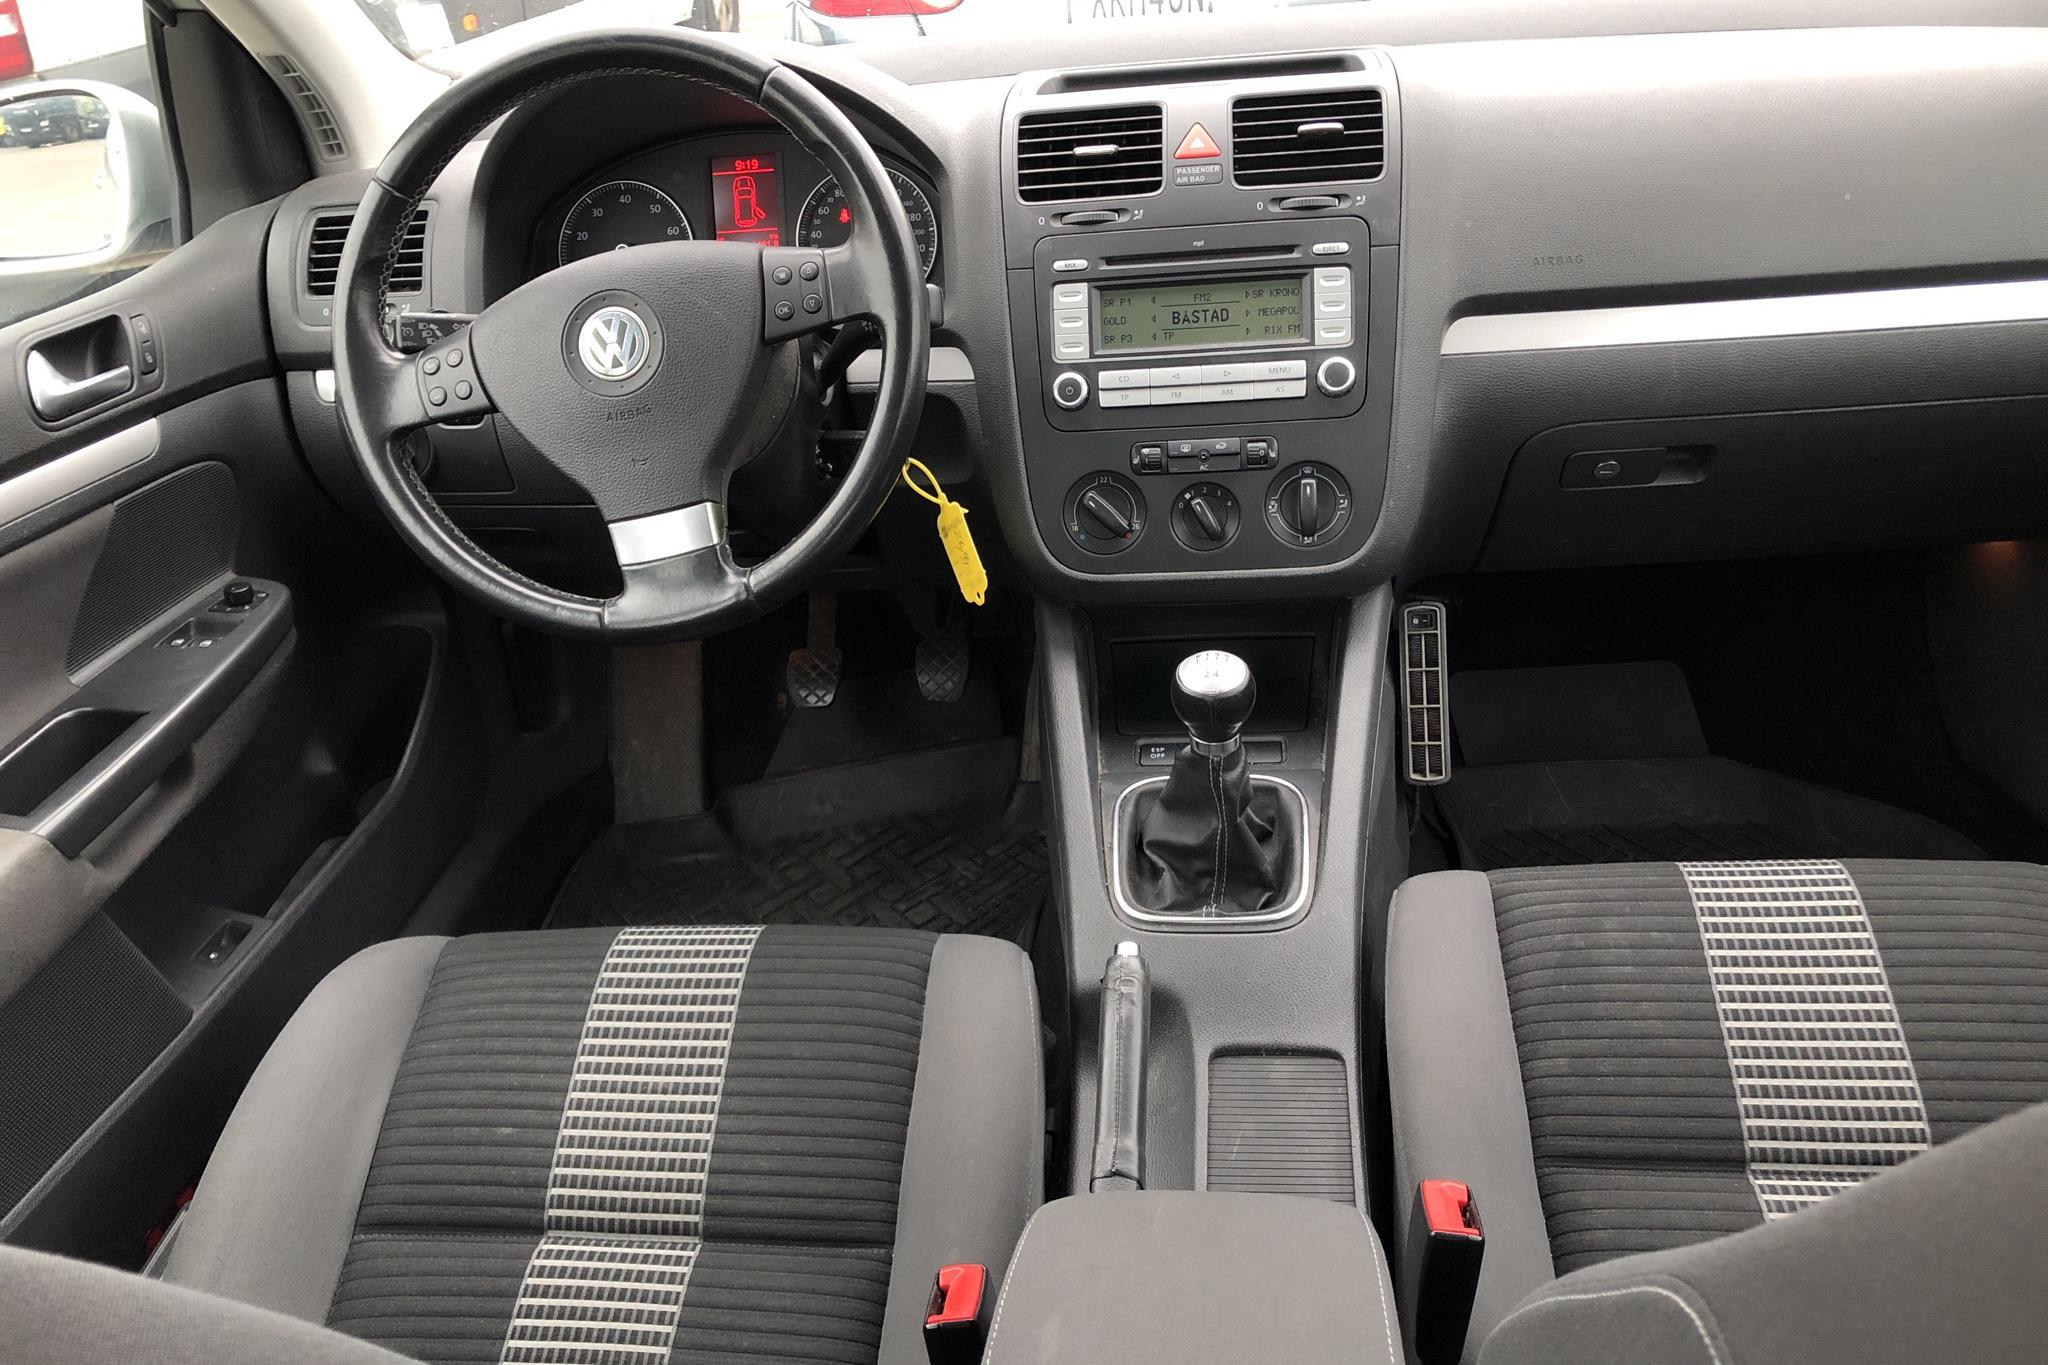 VW Golf A5 1.6 MultiFuel E85 5dr (102hk) - 162 450 km - Manual - silver - 2009